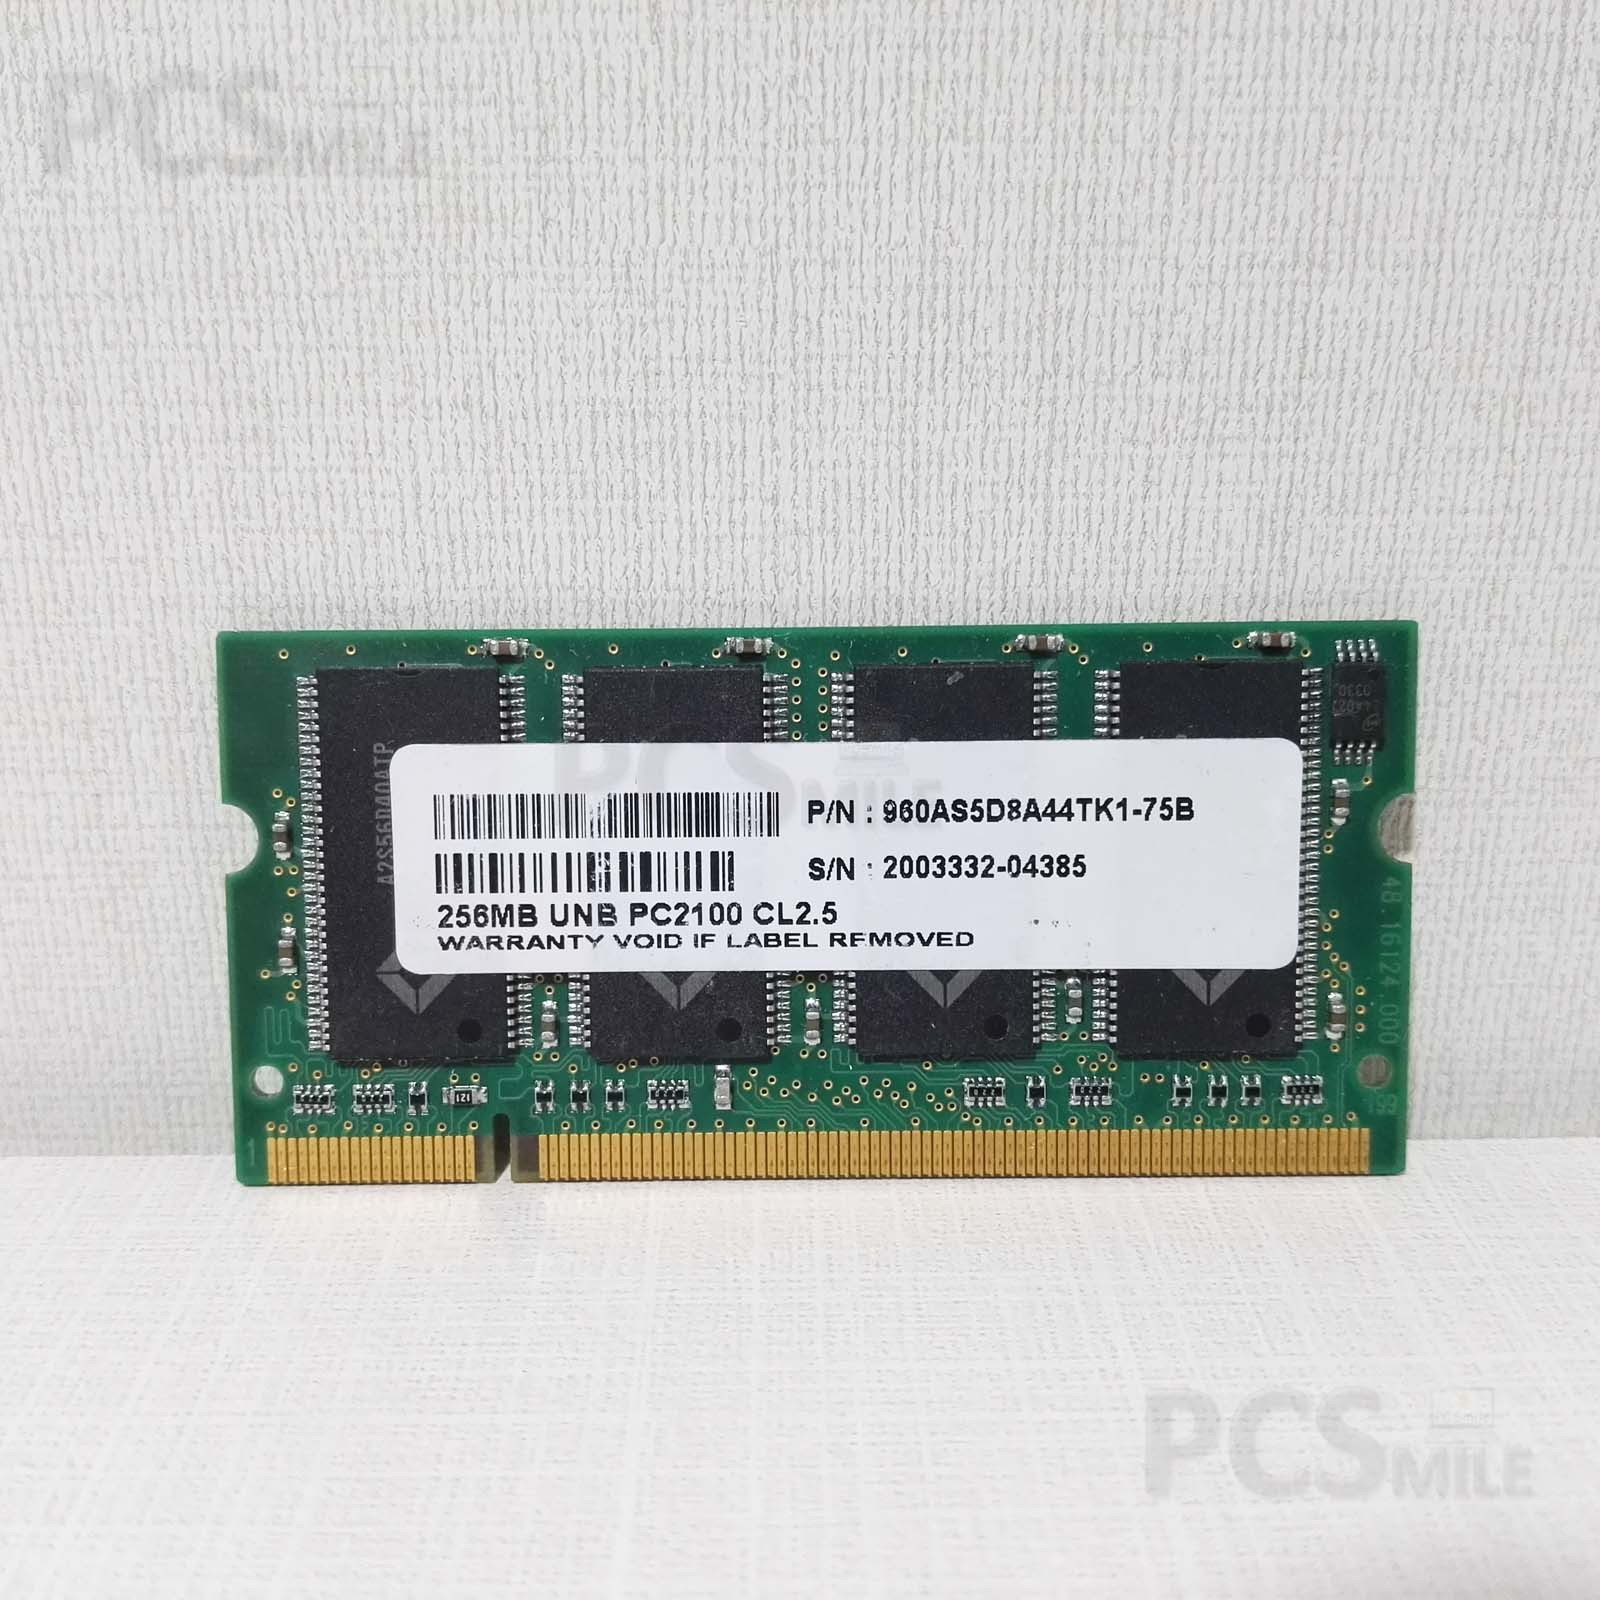 RAM Apacer 256mb 960AS5D8A44TK1-75B PC2100 CL2.5